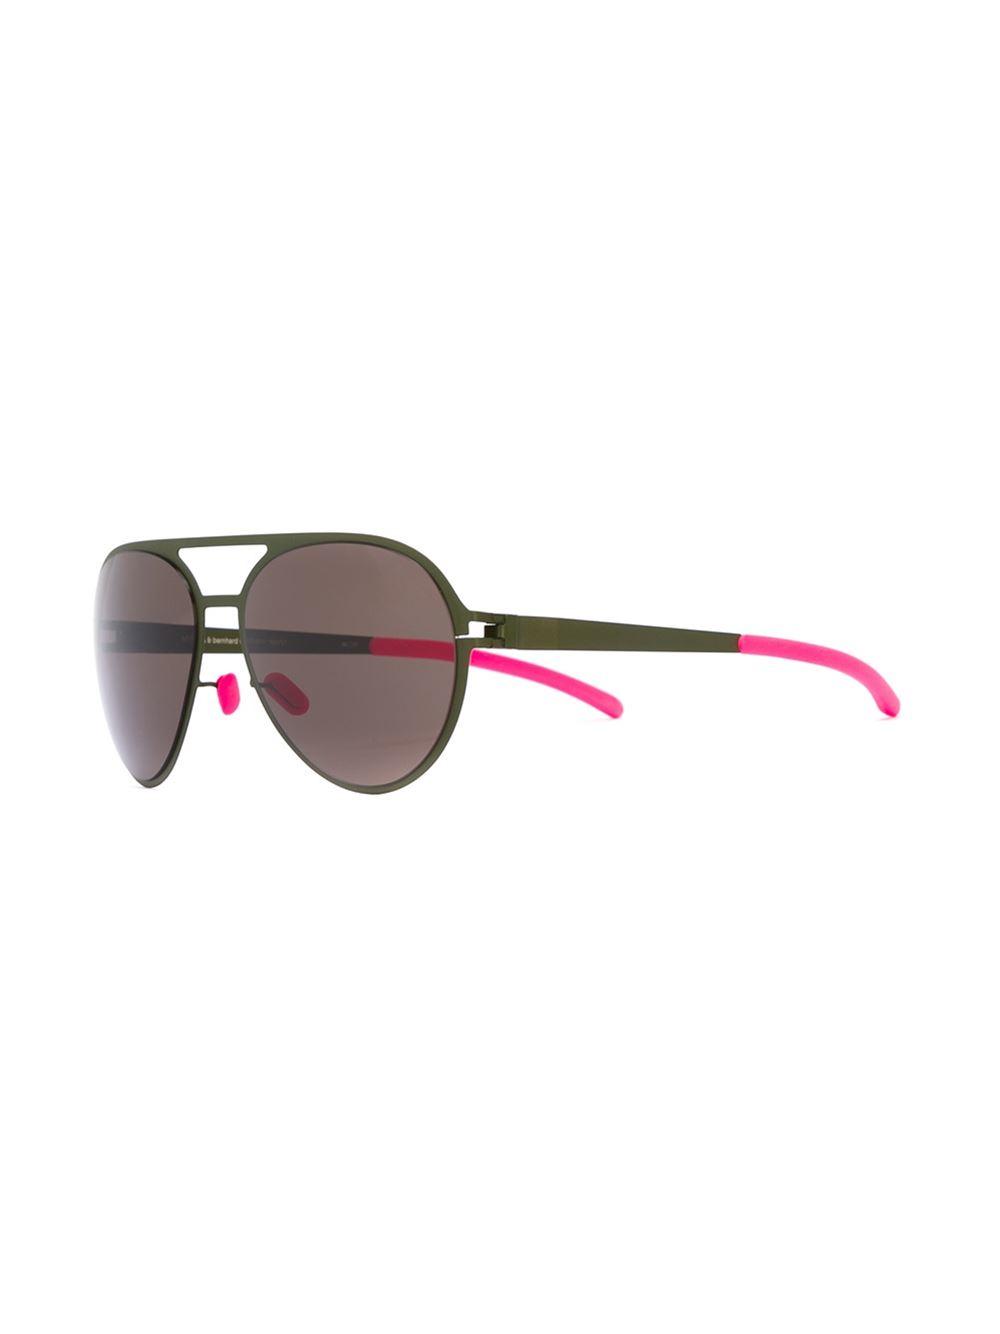 Mykita Bernard Willhem X 'gustl' Sunglasses in Green